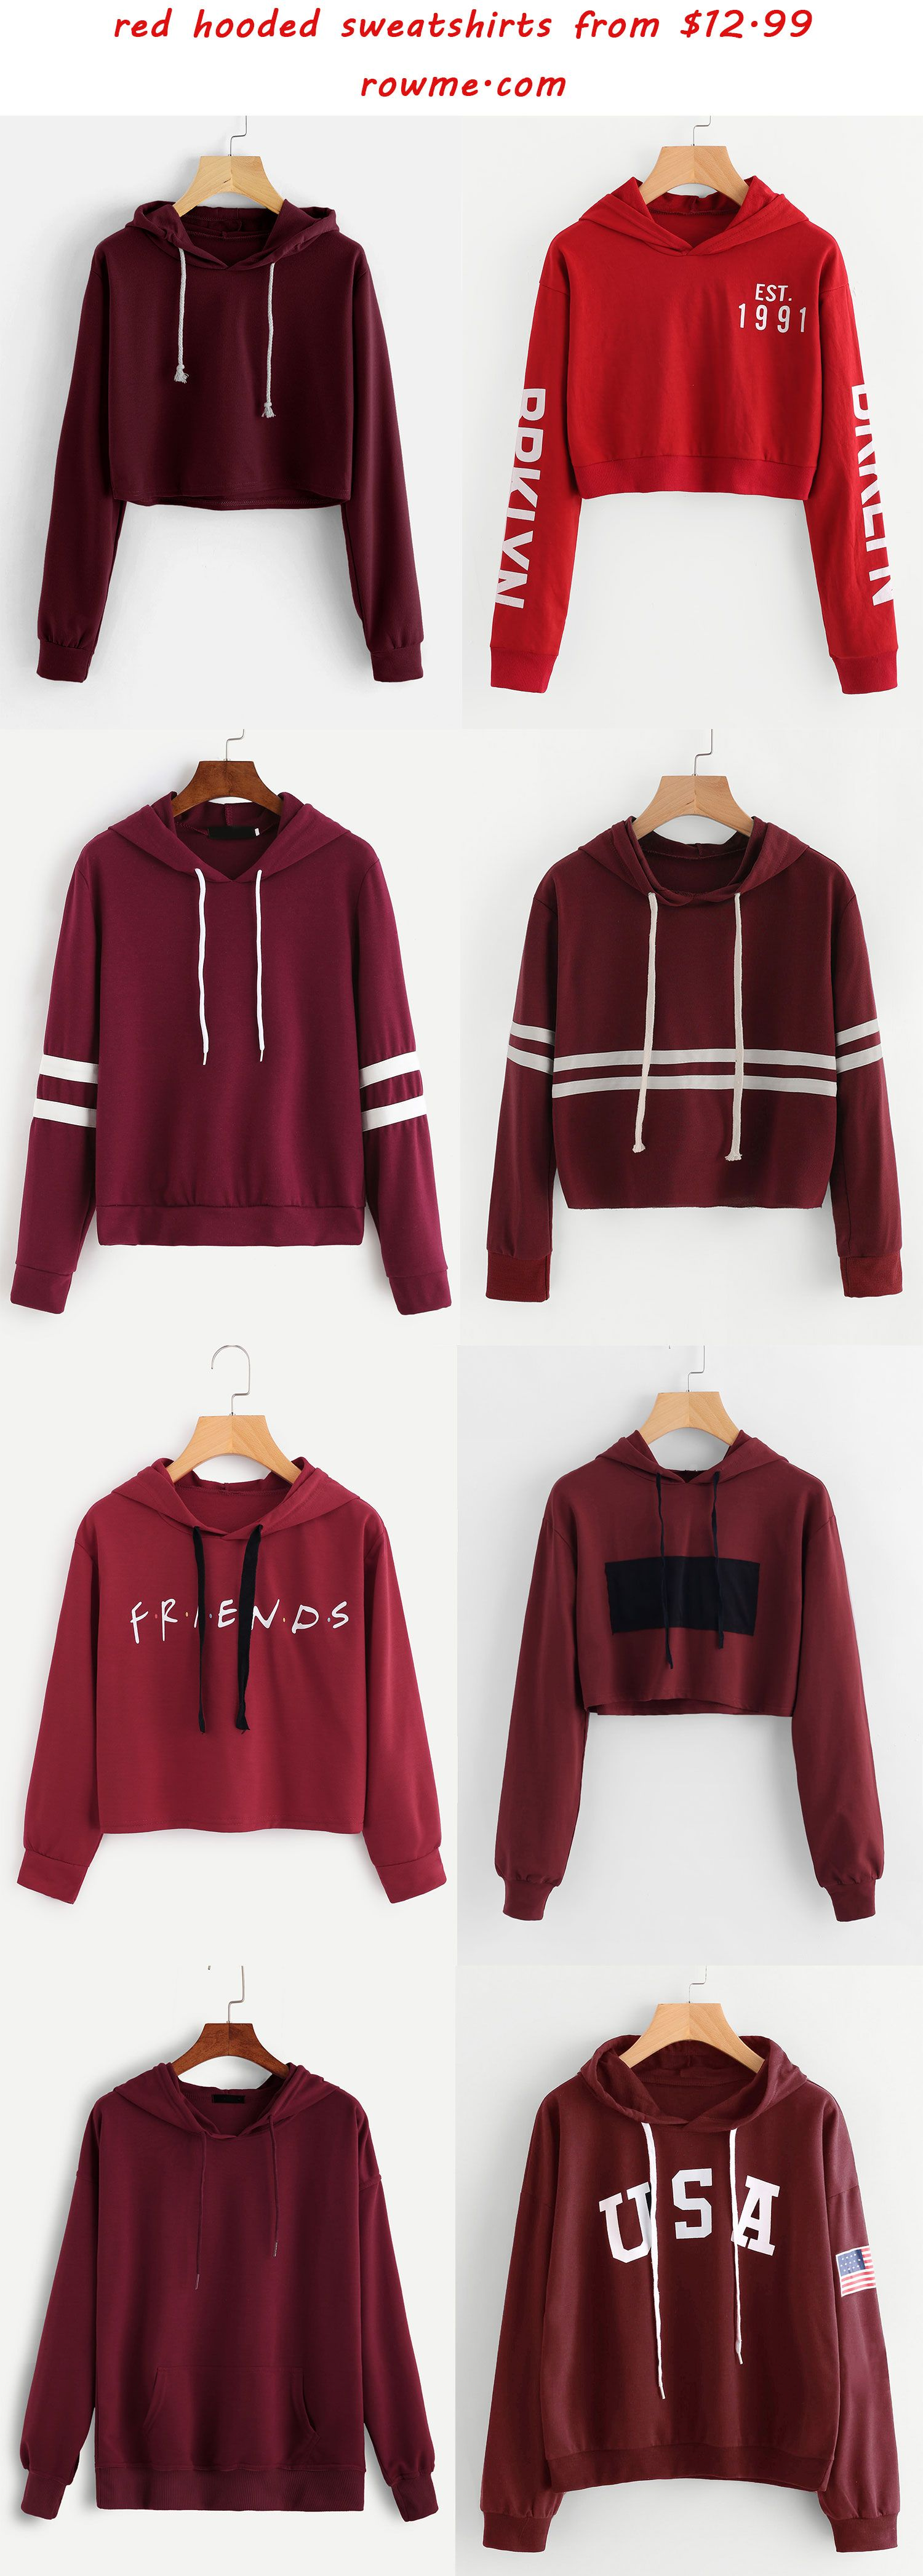 red hooded sweatshirts - romwe.com